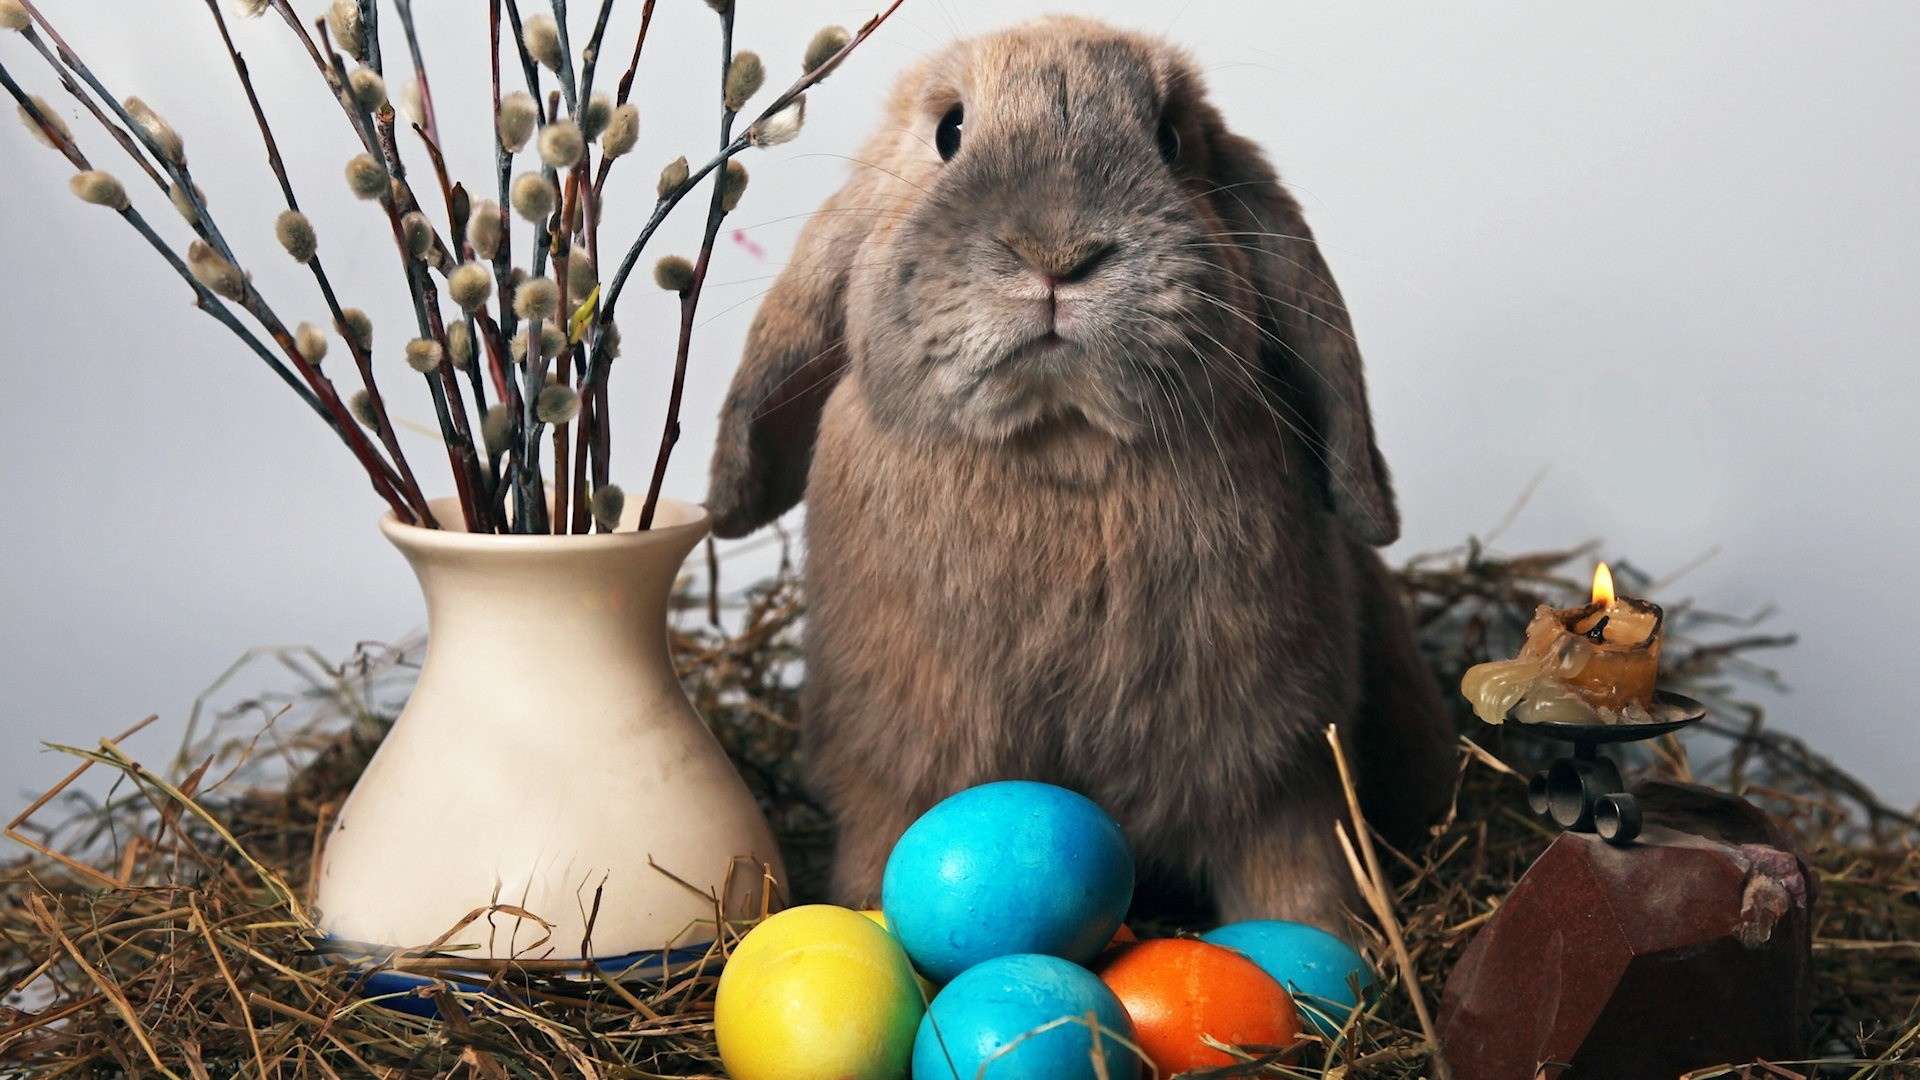 Happy Easter Desktop Wallpaper HD (1)